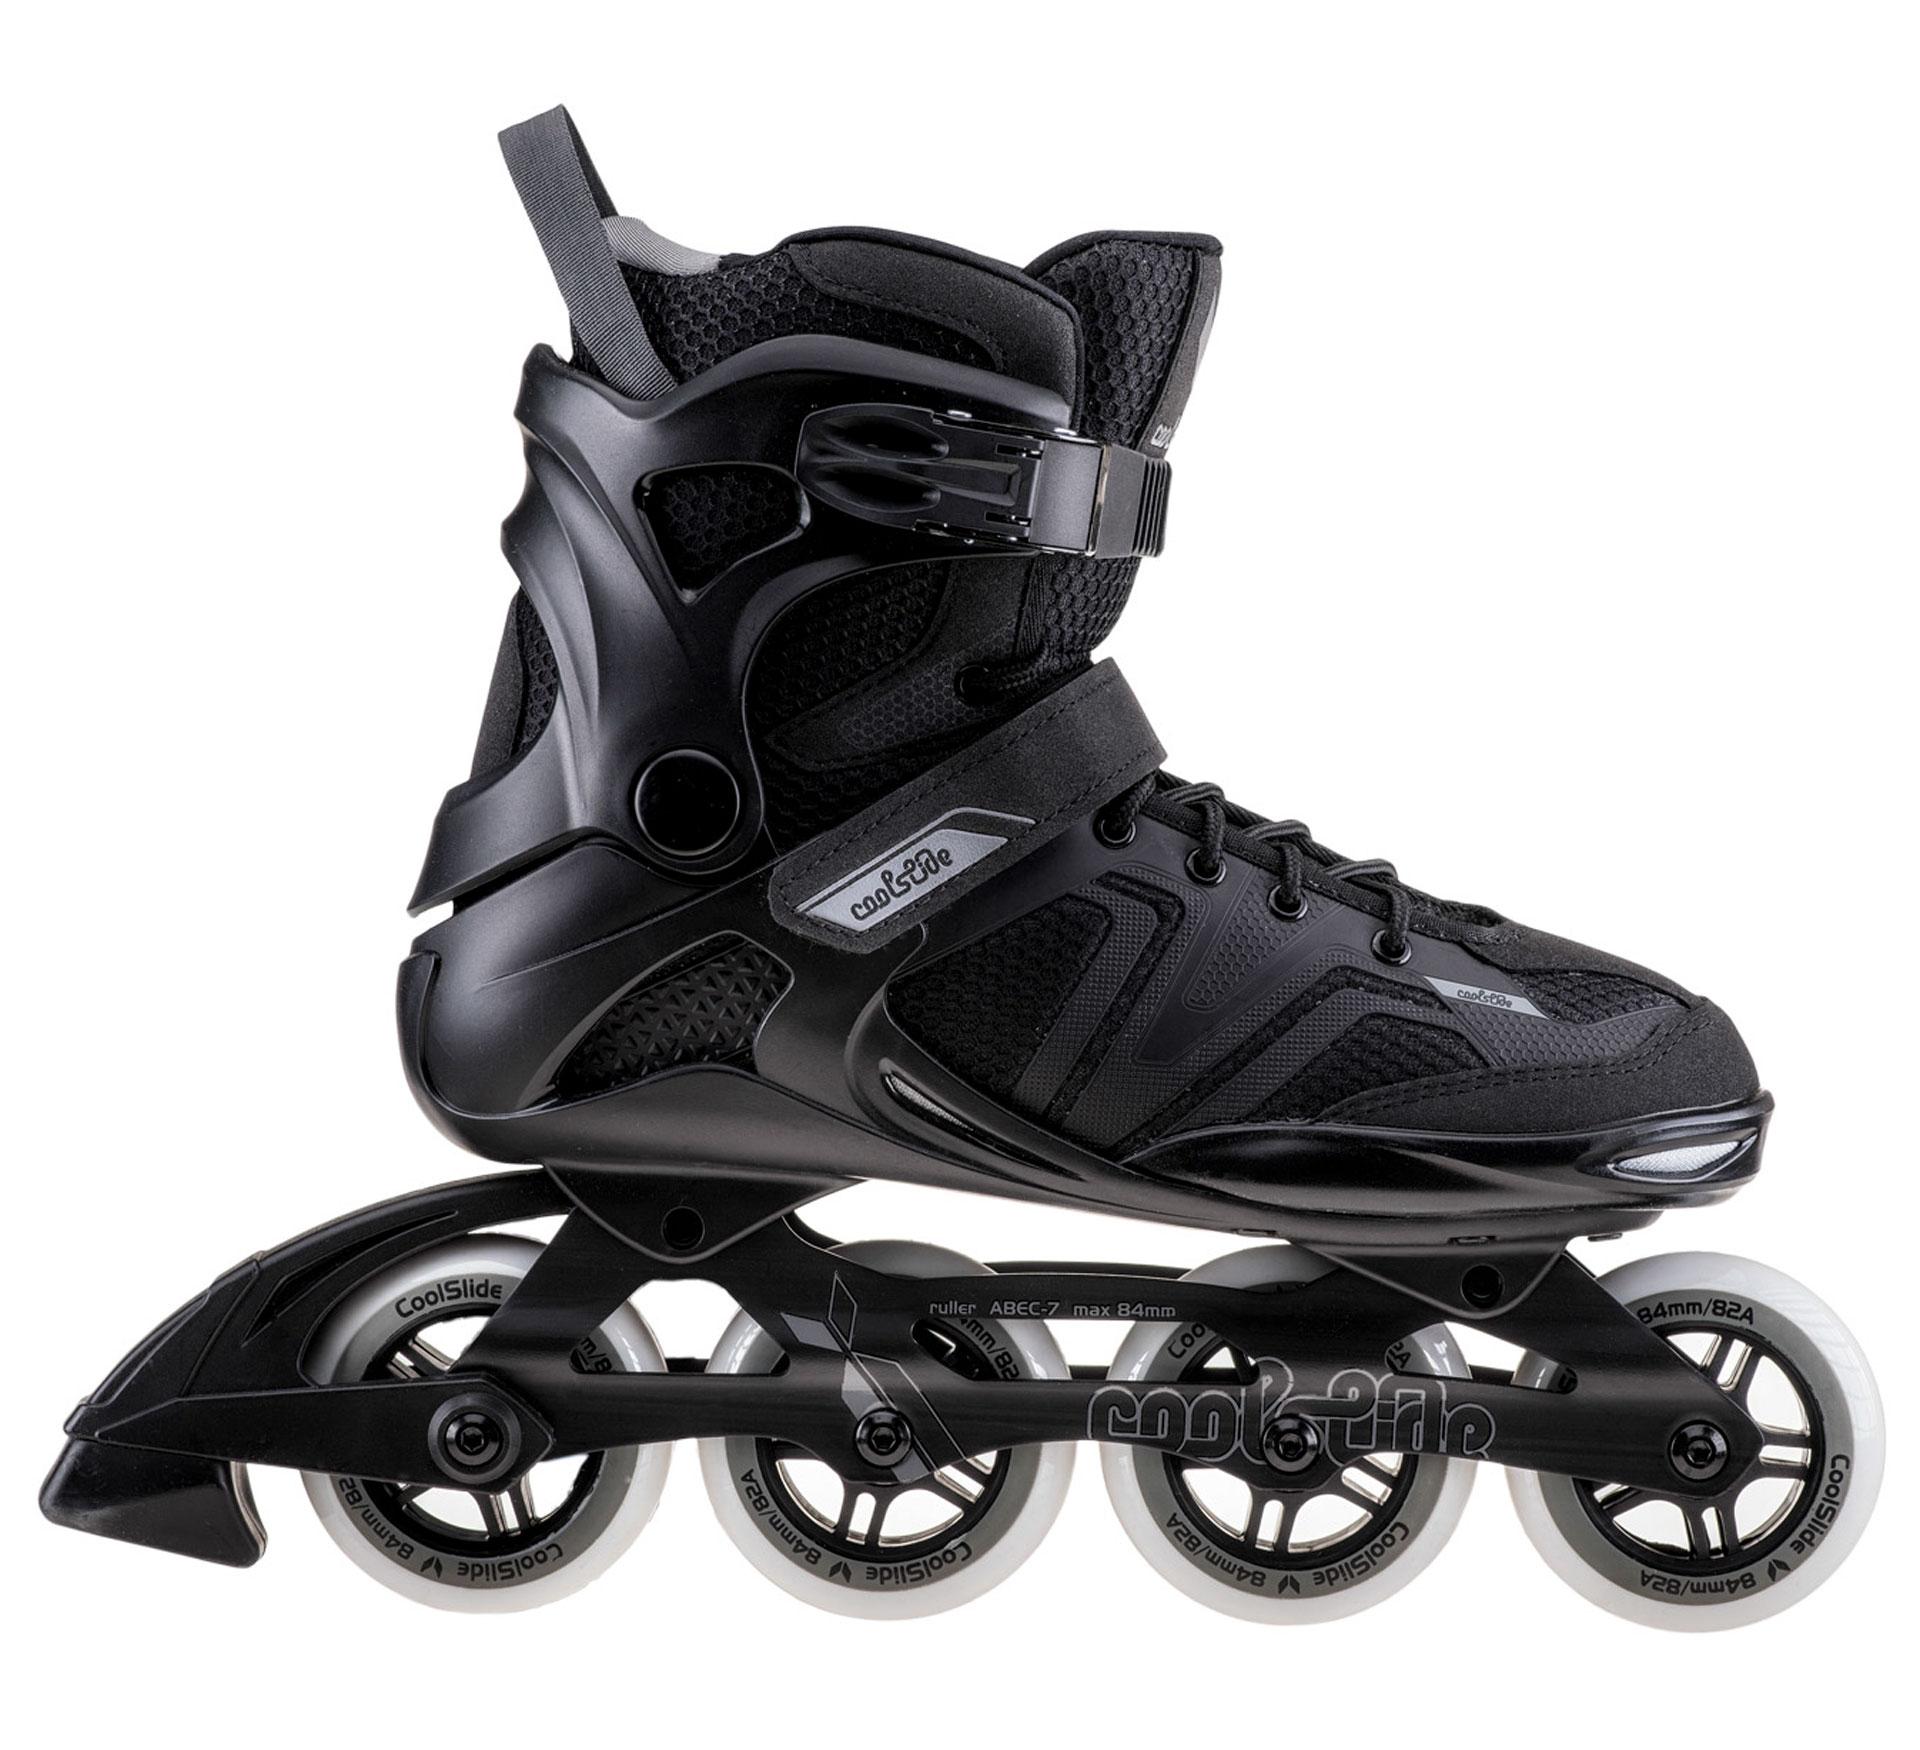 Coolslide Ruller Skates Heren